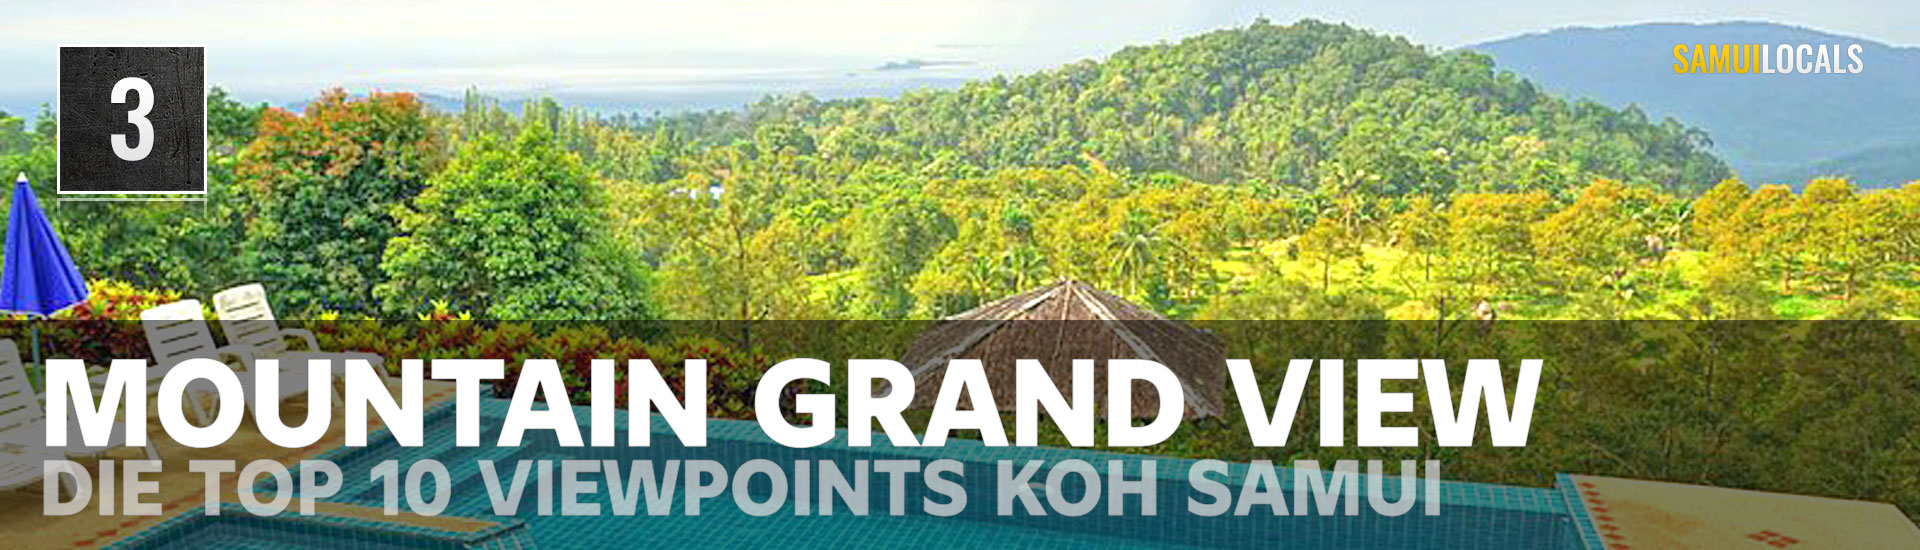 viewpoint_koh_samui_mountain_grand_view